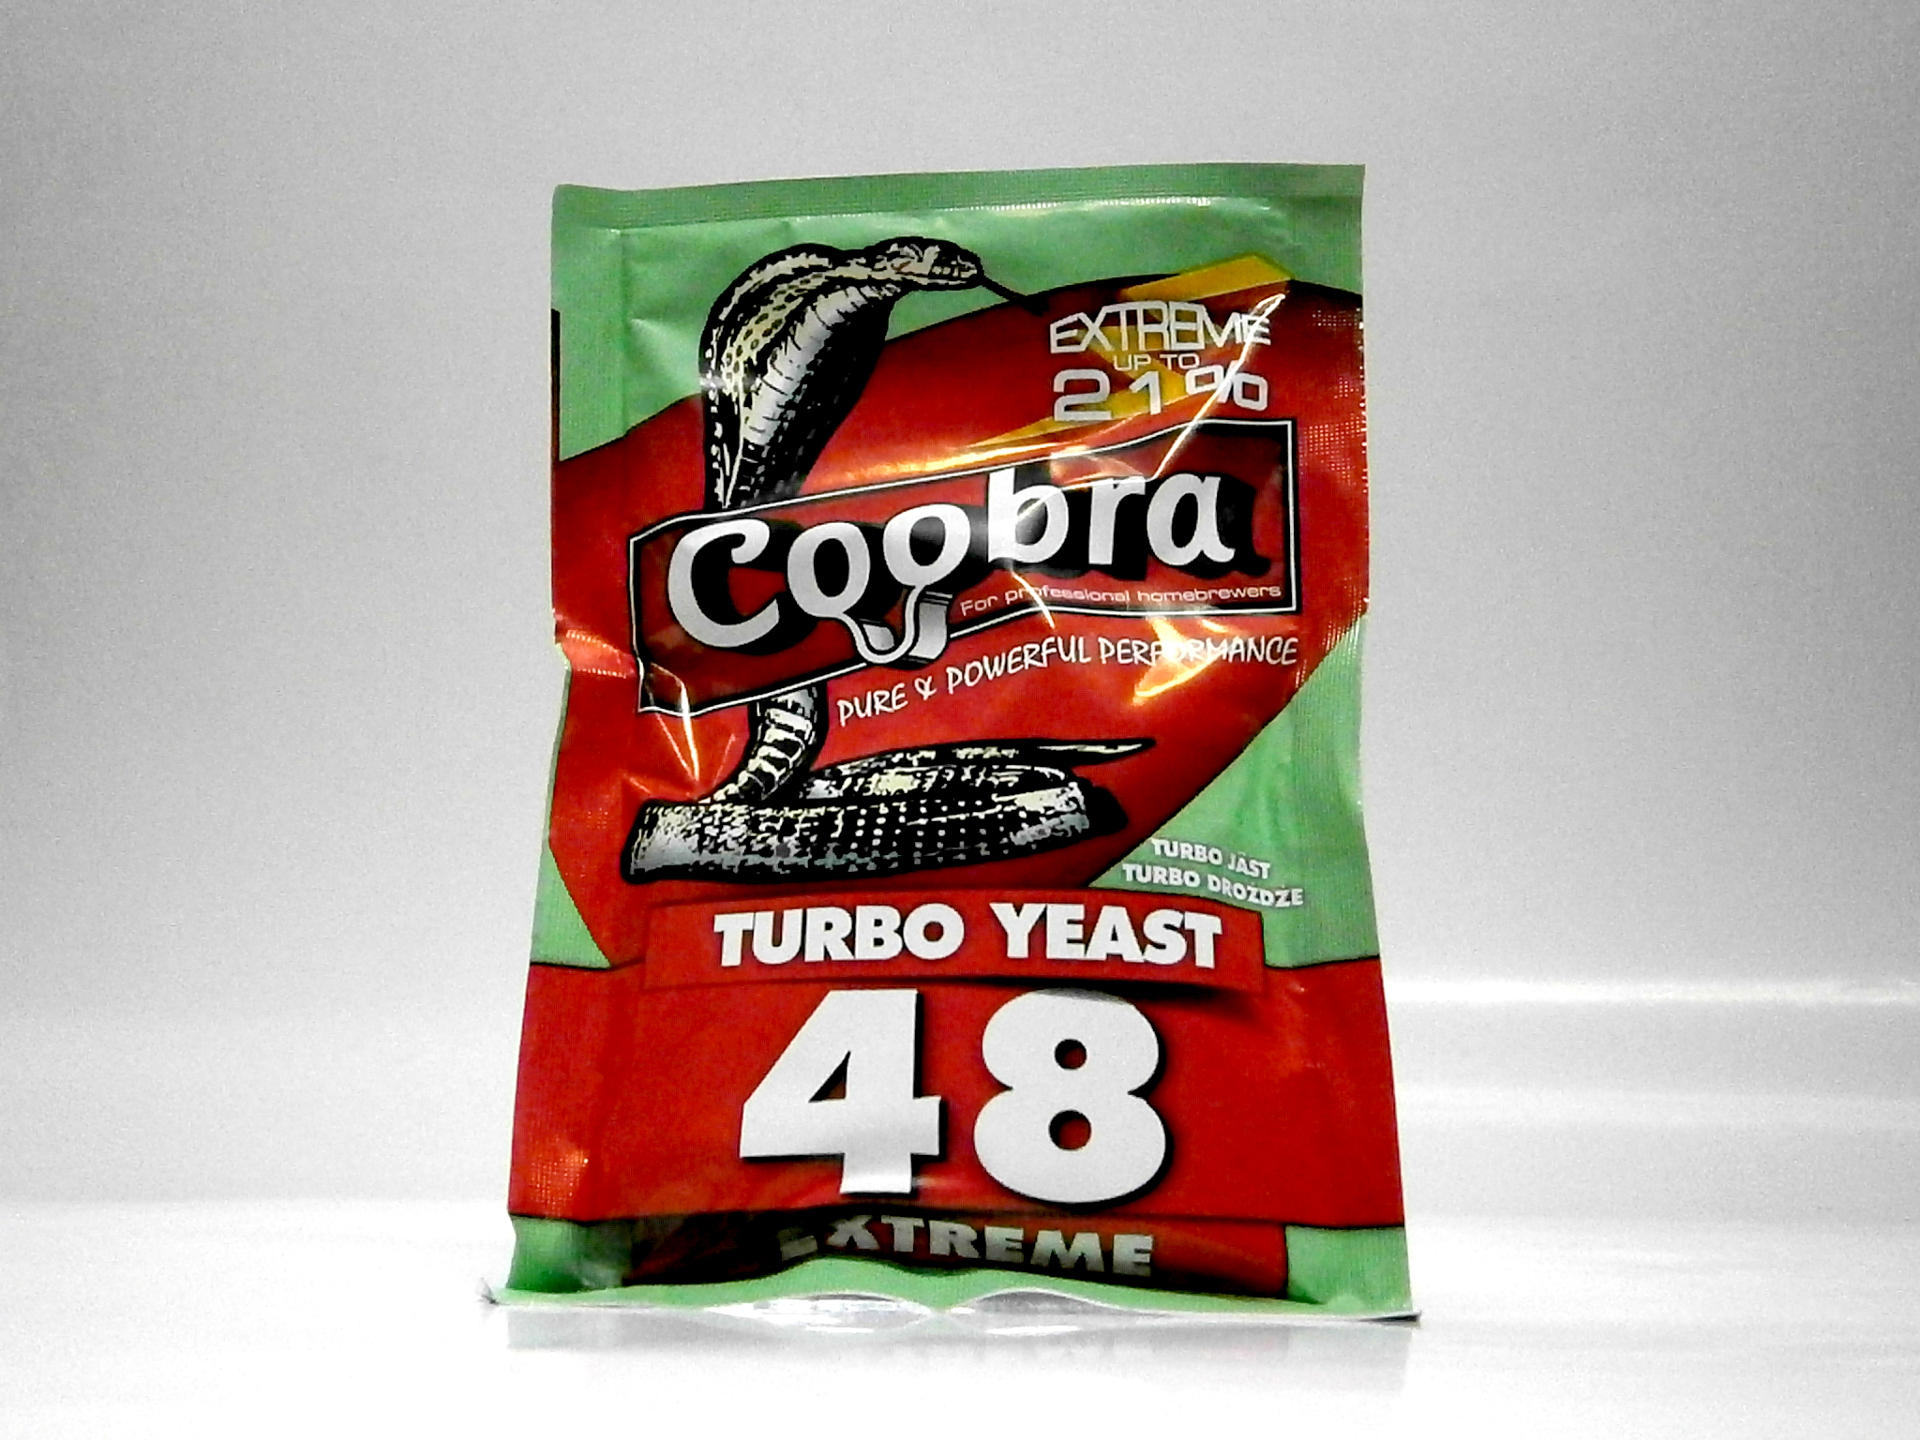 Coobra 48 - Do cukru lub glukozy